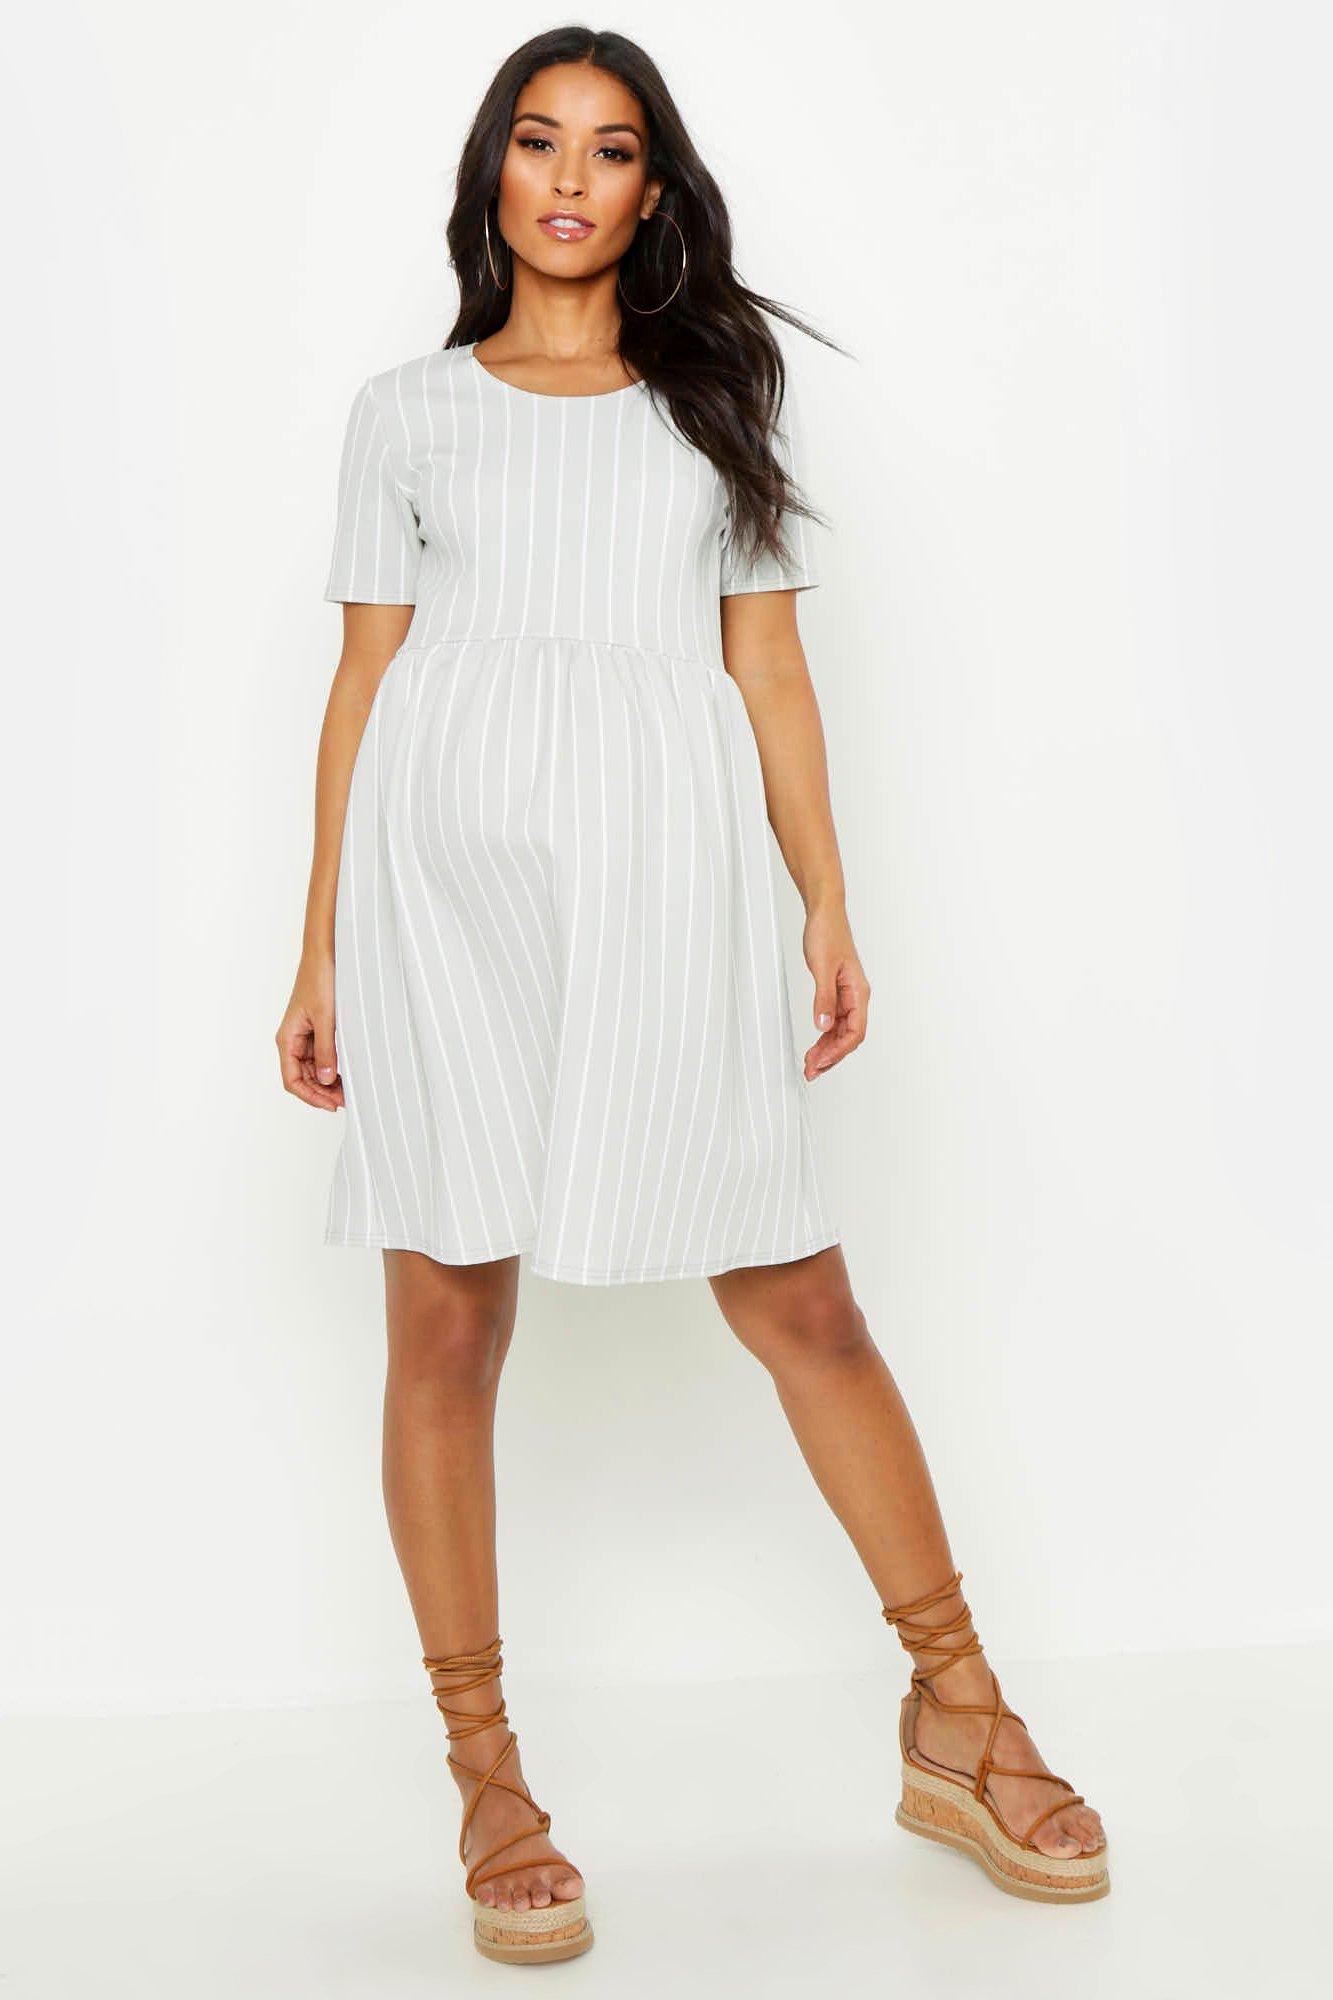 9d6379594db3 Lyst - Boohoo Maternity Stripe Smock Dress in Gray